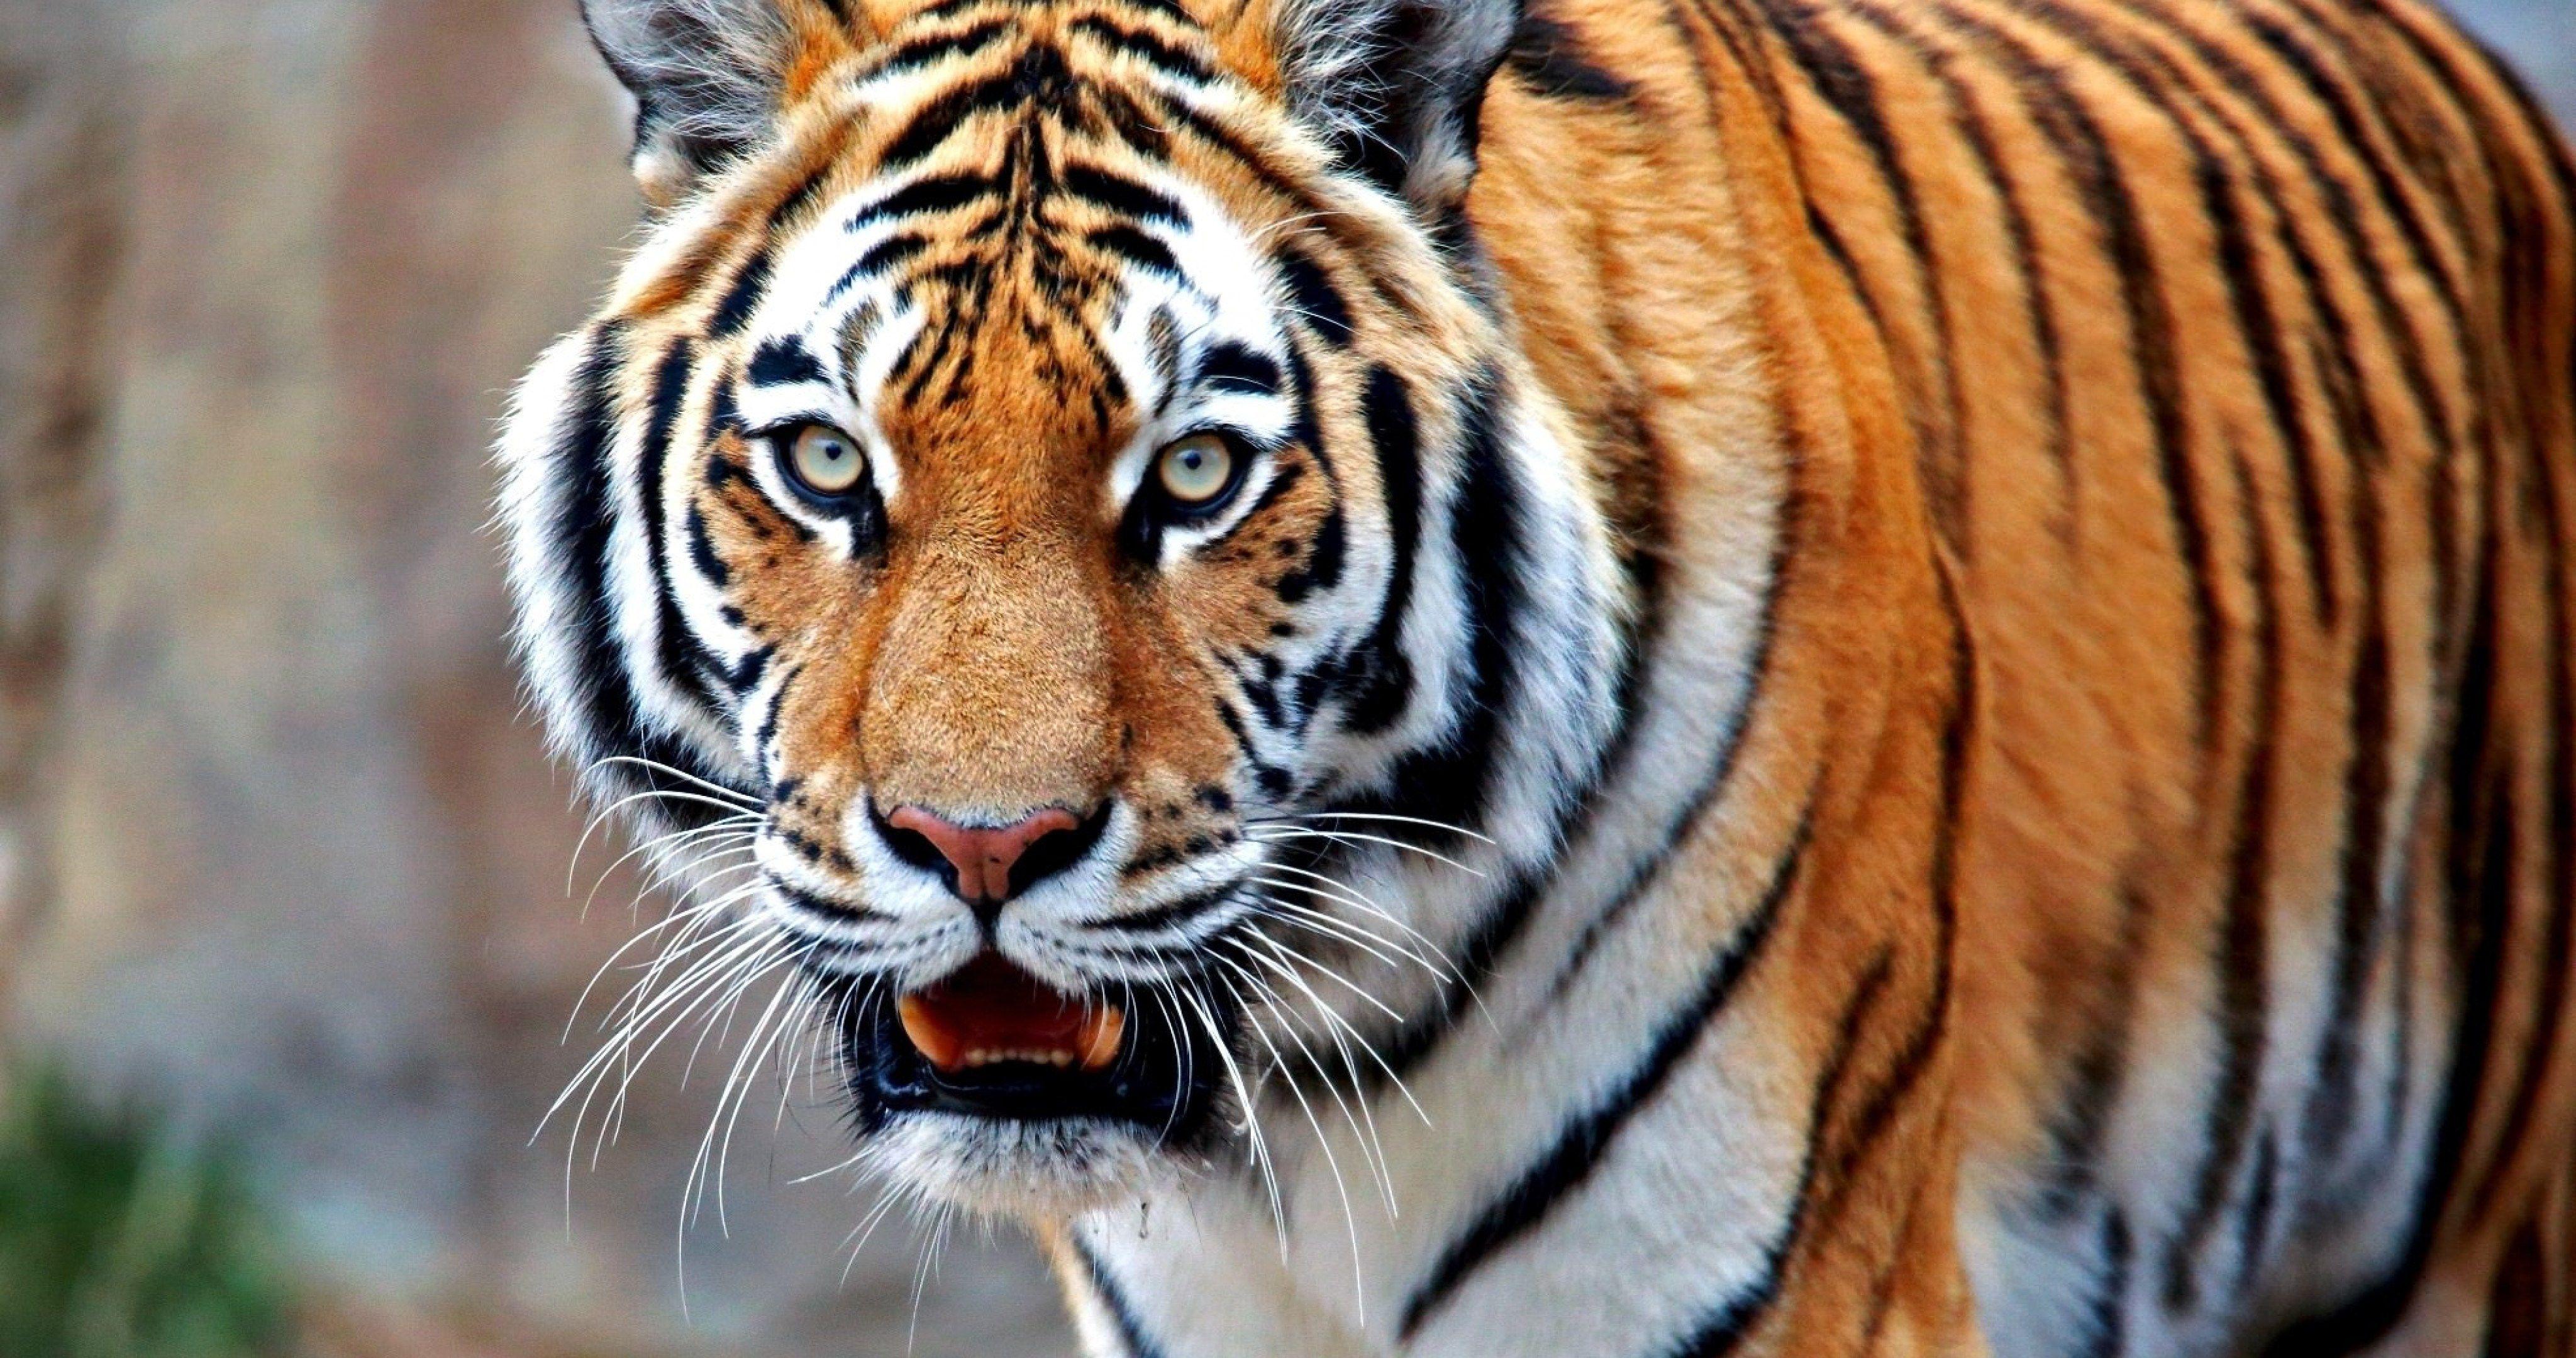 Colorful Tiger 4k Ultra Hd Wallpaper Tiger Hd Wallpaper Wallpaper